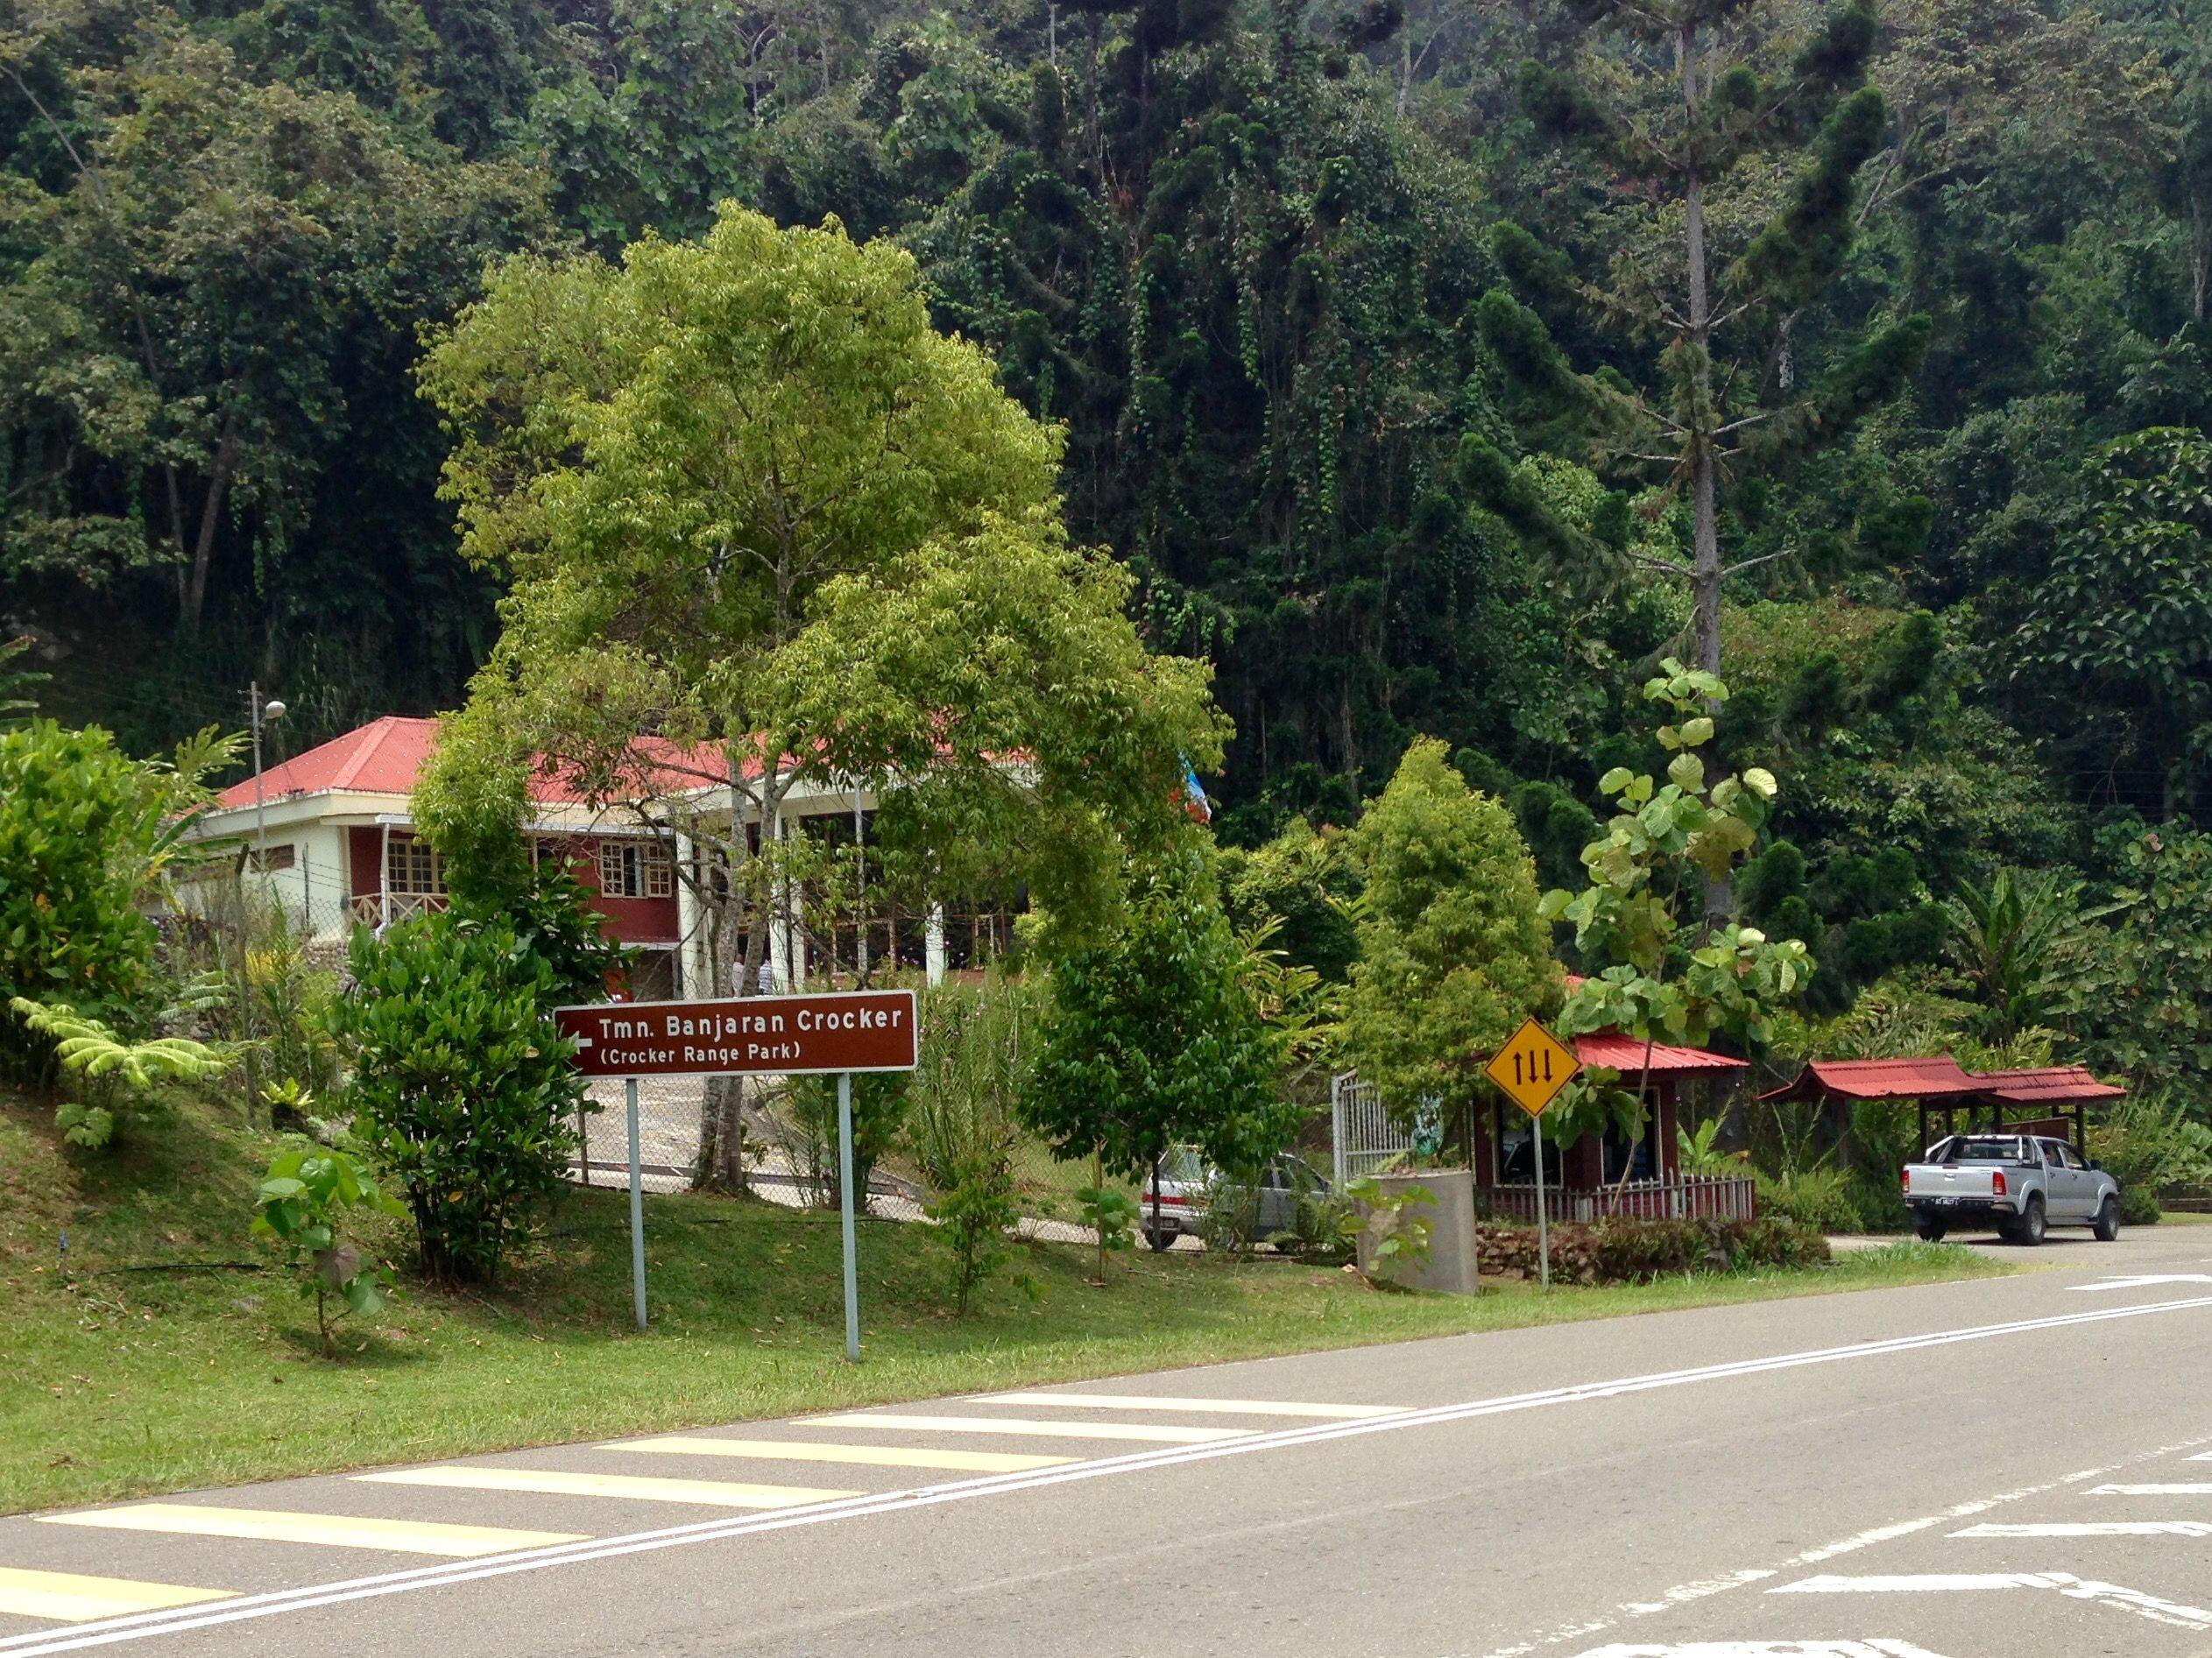 Crocker Range Park In Sabah On The Keningau Kimanis Highway That Crosses The Crocker Range Sabah Country Roads Borneo